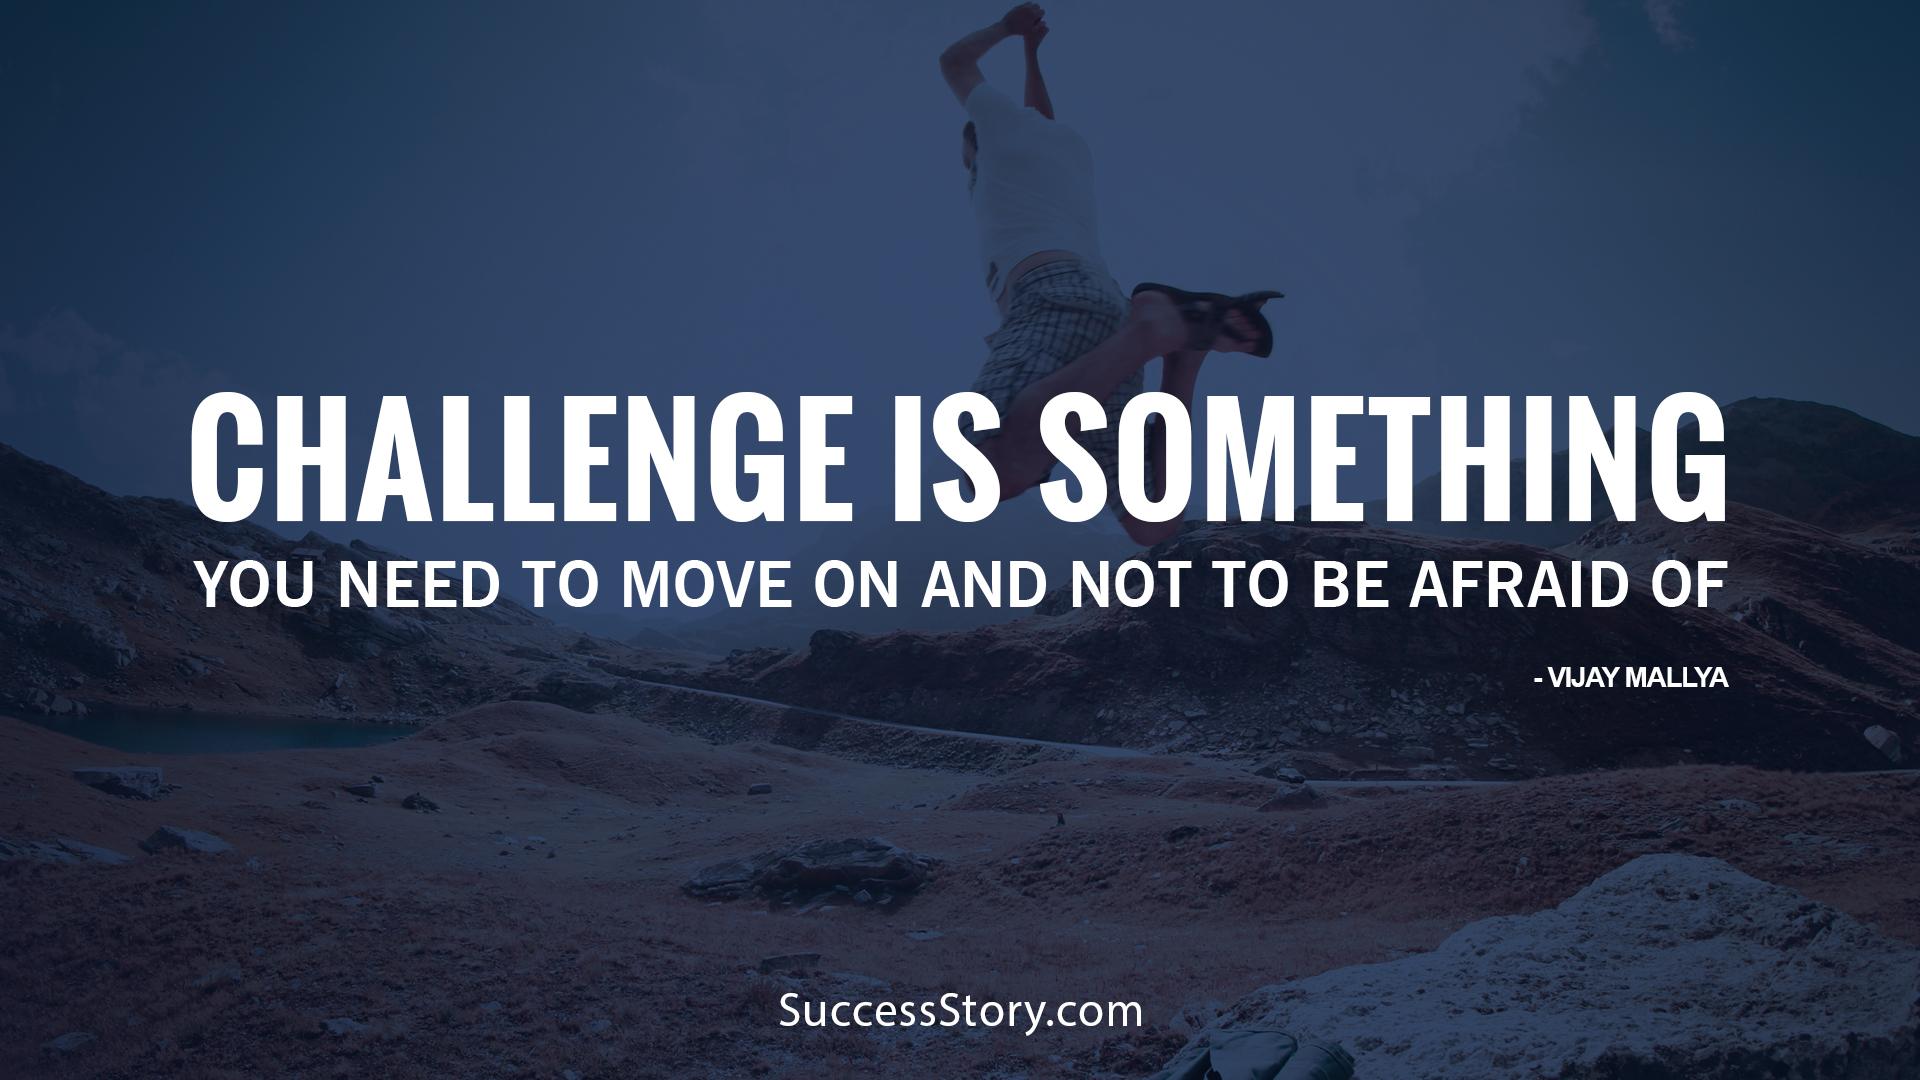 Challenge is something